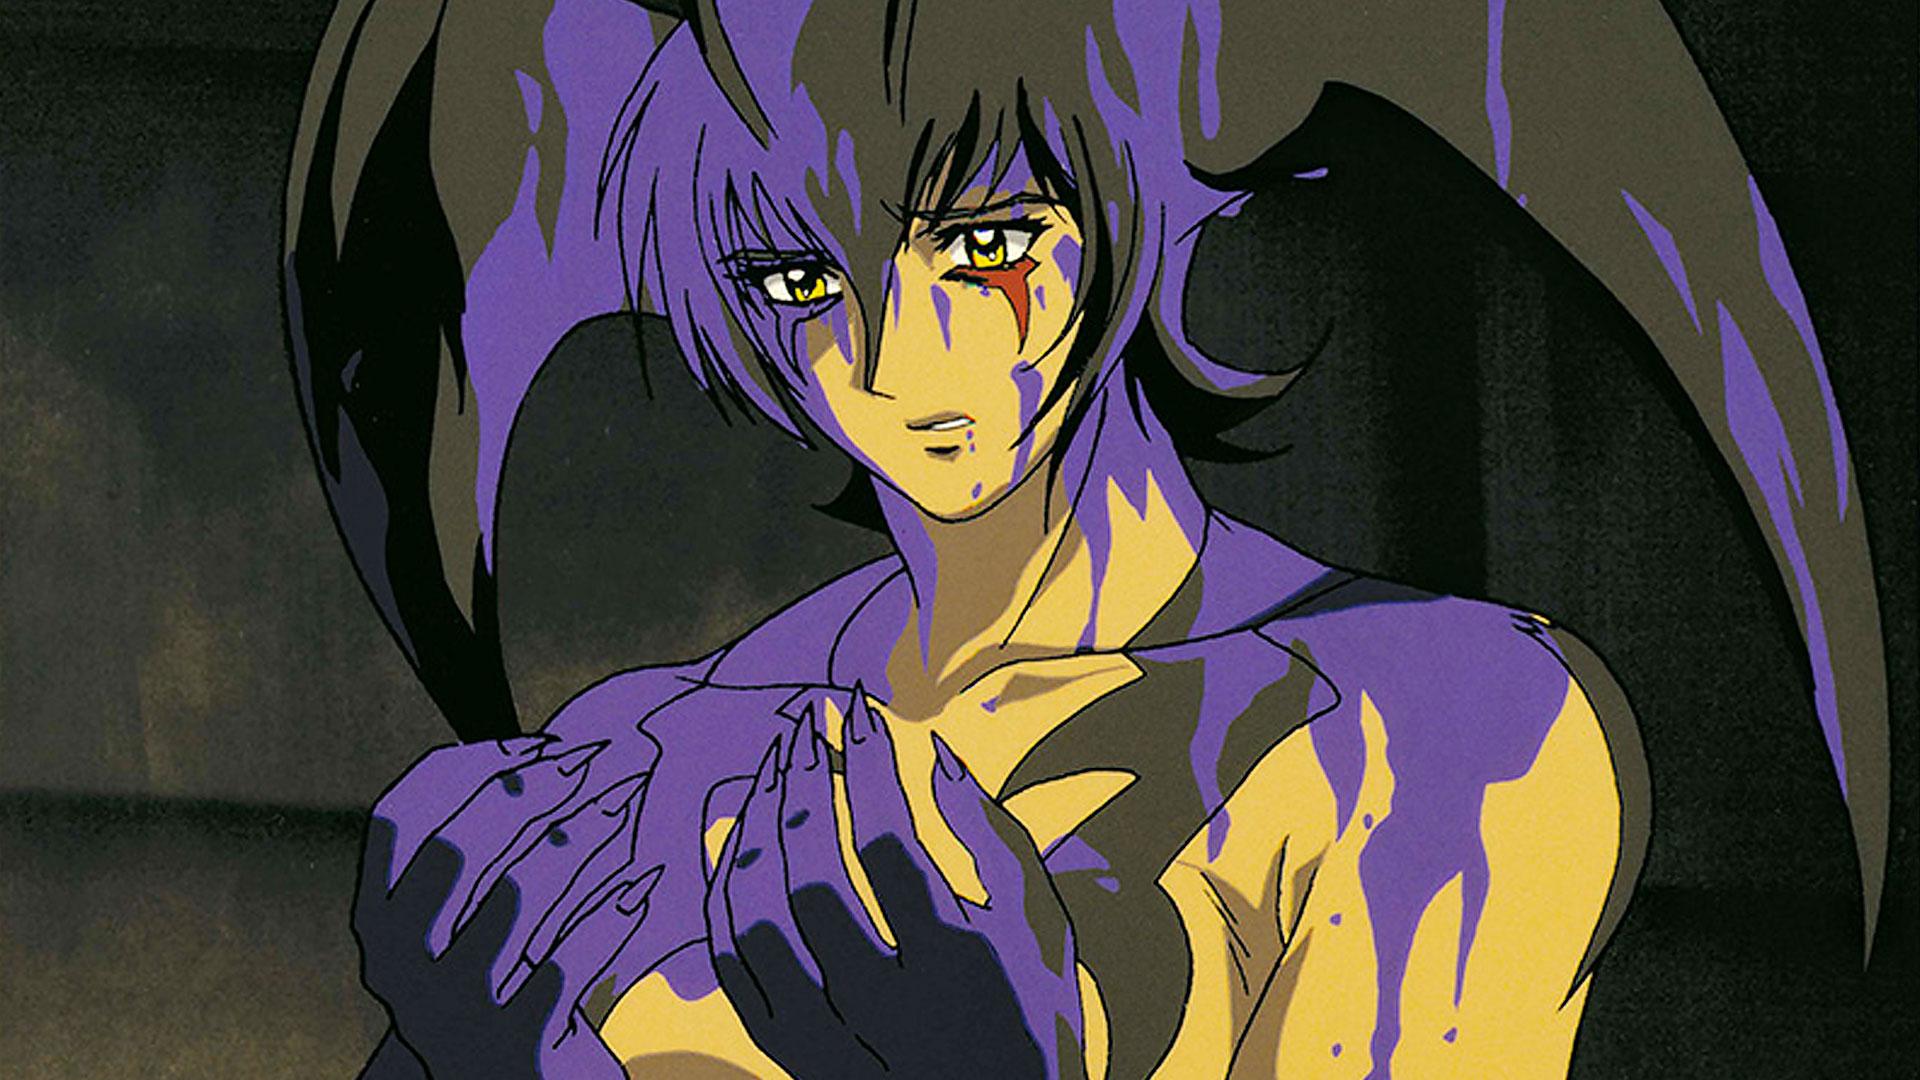 The Devil Lady banner image